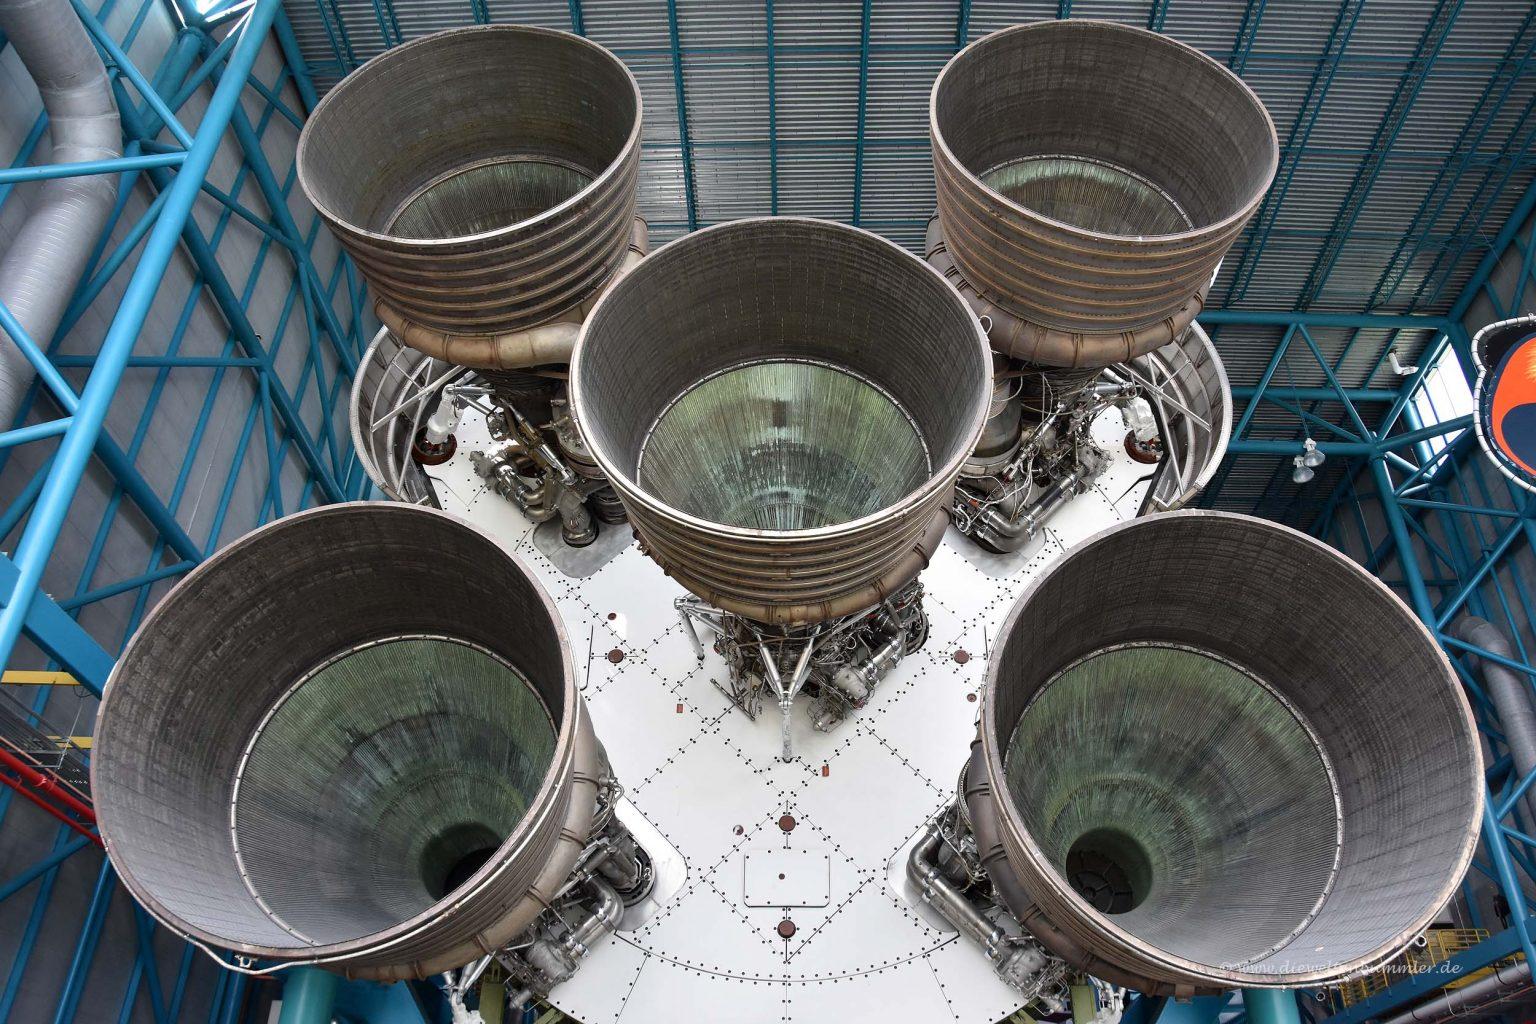 Triebwerke der Saturn V